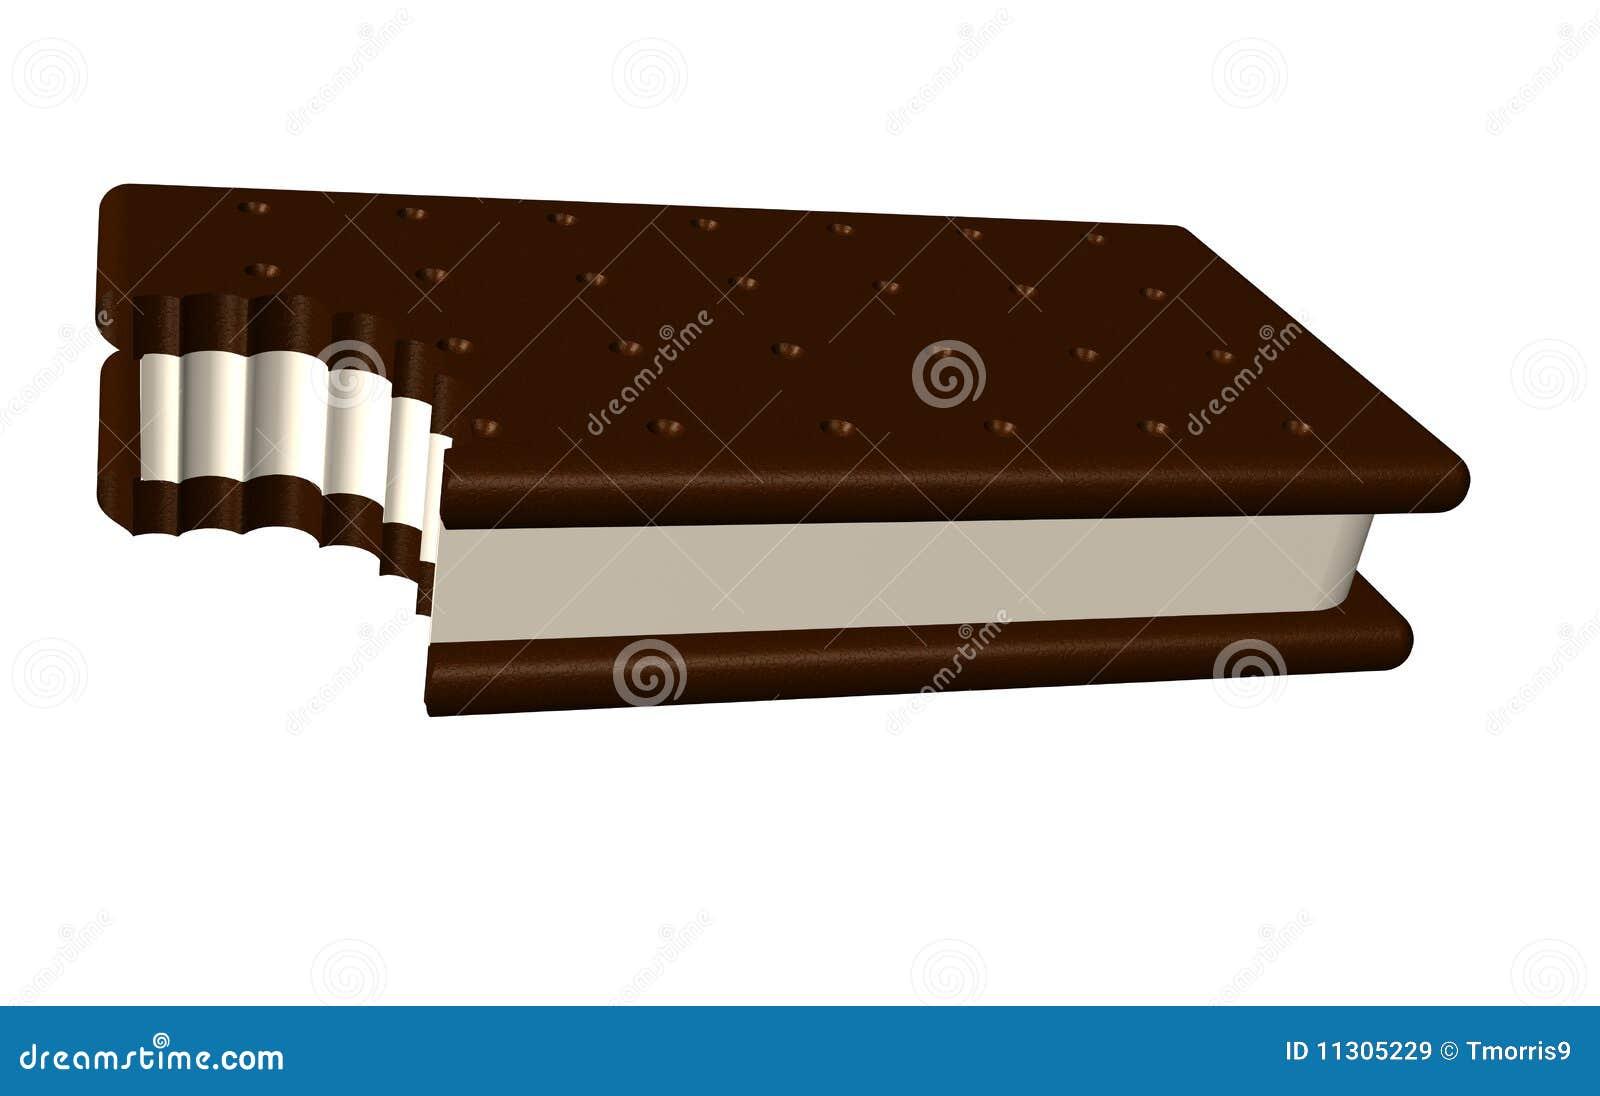 Ice Cream Sandwich Furniture For Ice Cream Sandwich Bit Stock Illustration Illustration Of Milk